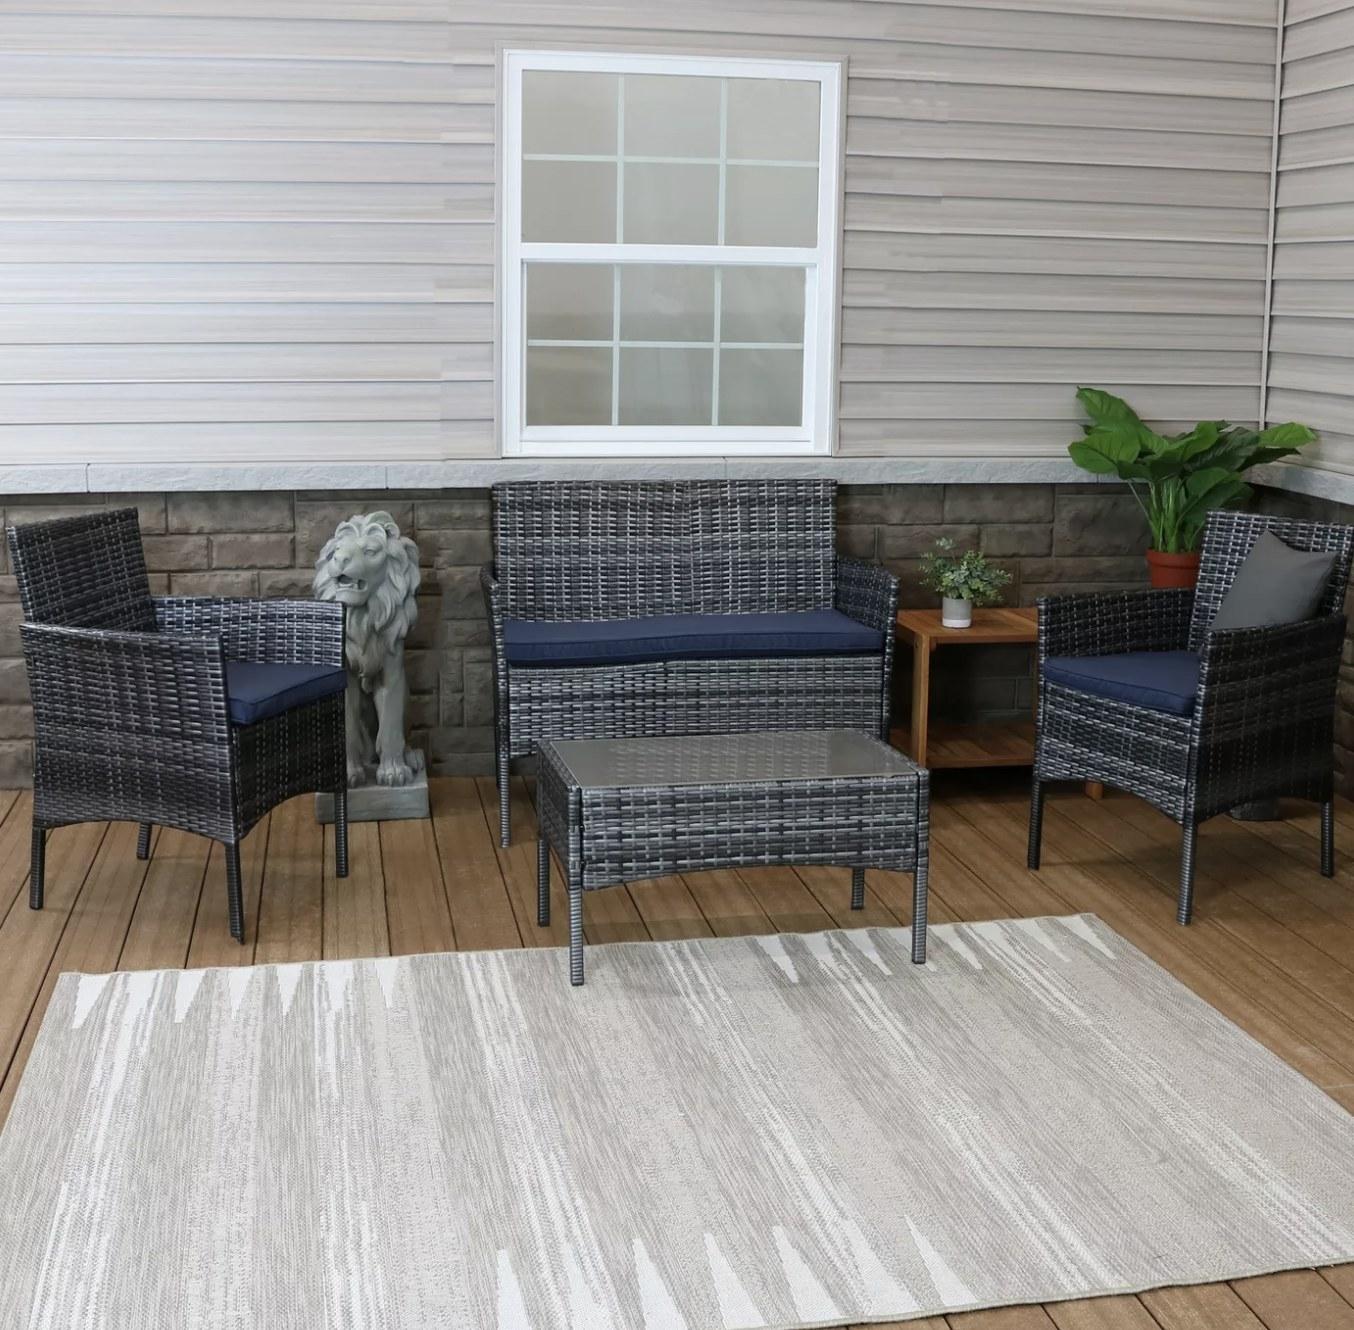 The four-piece rattan patio set